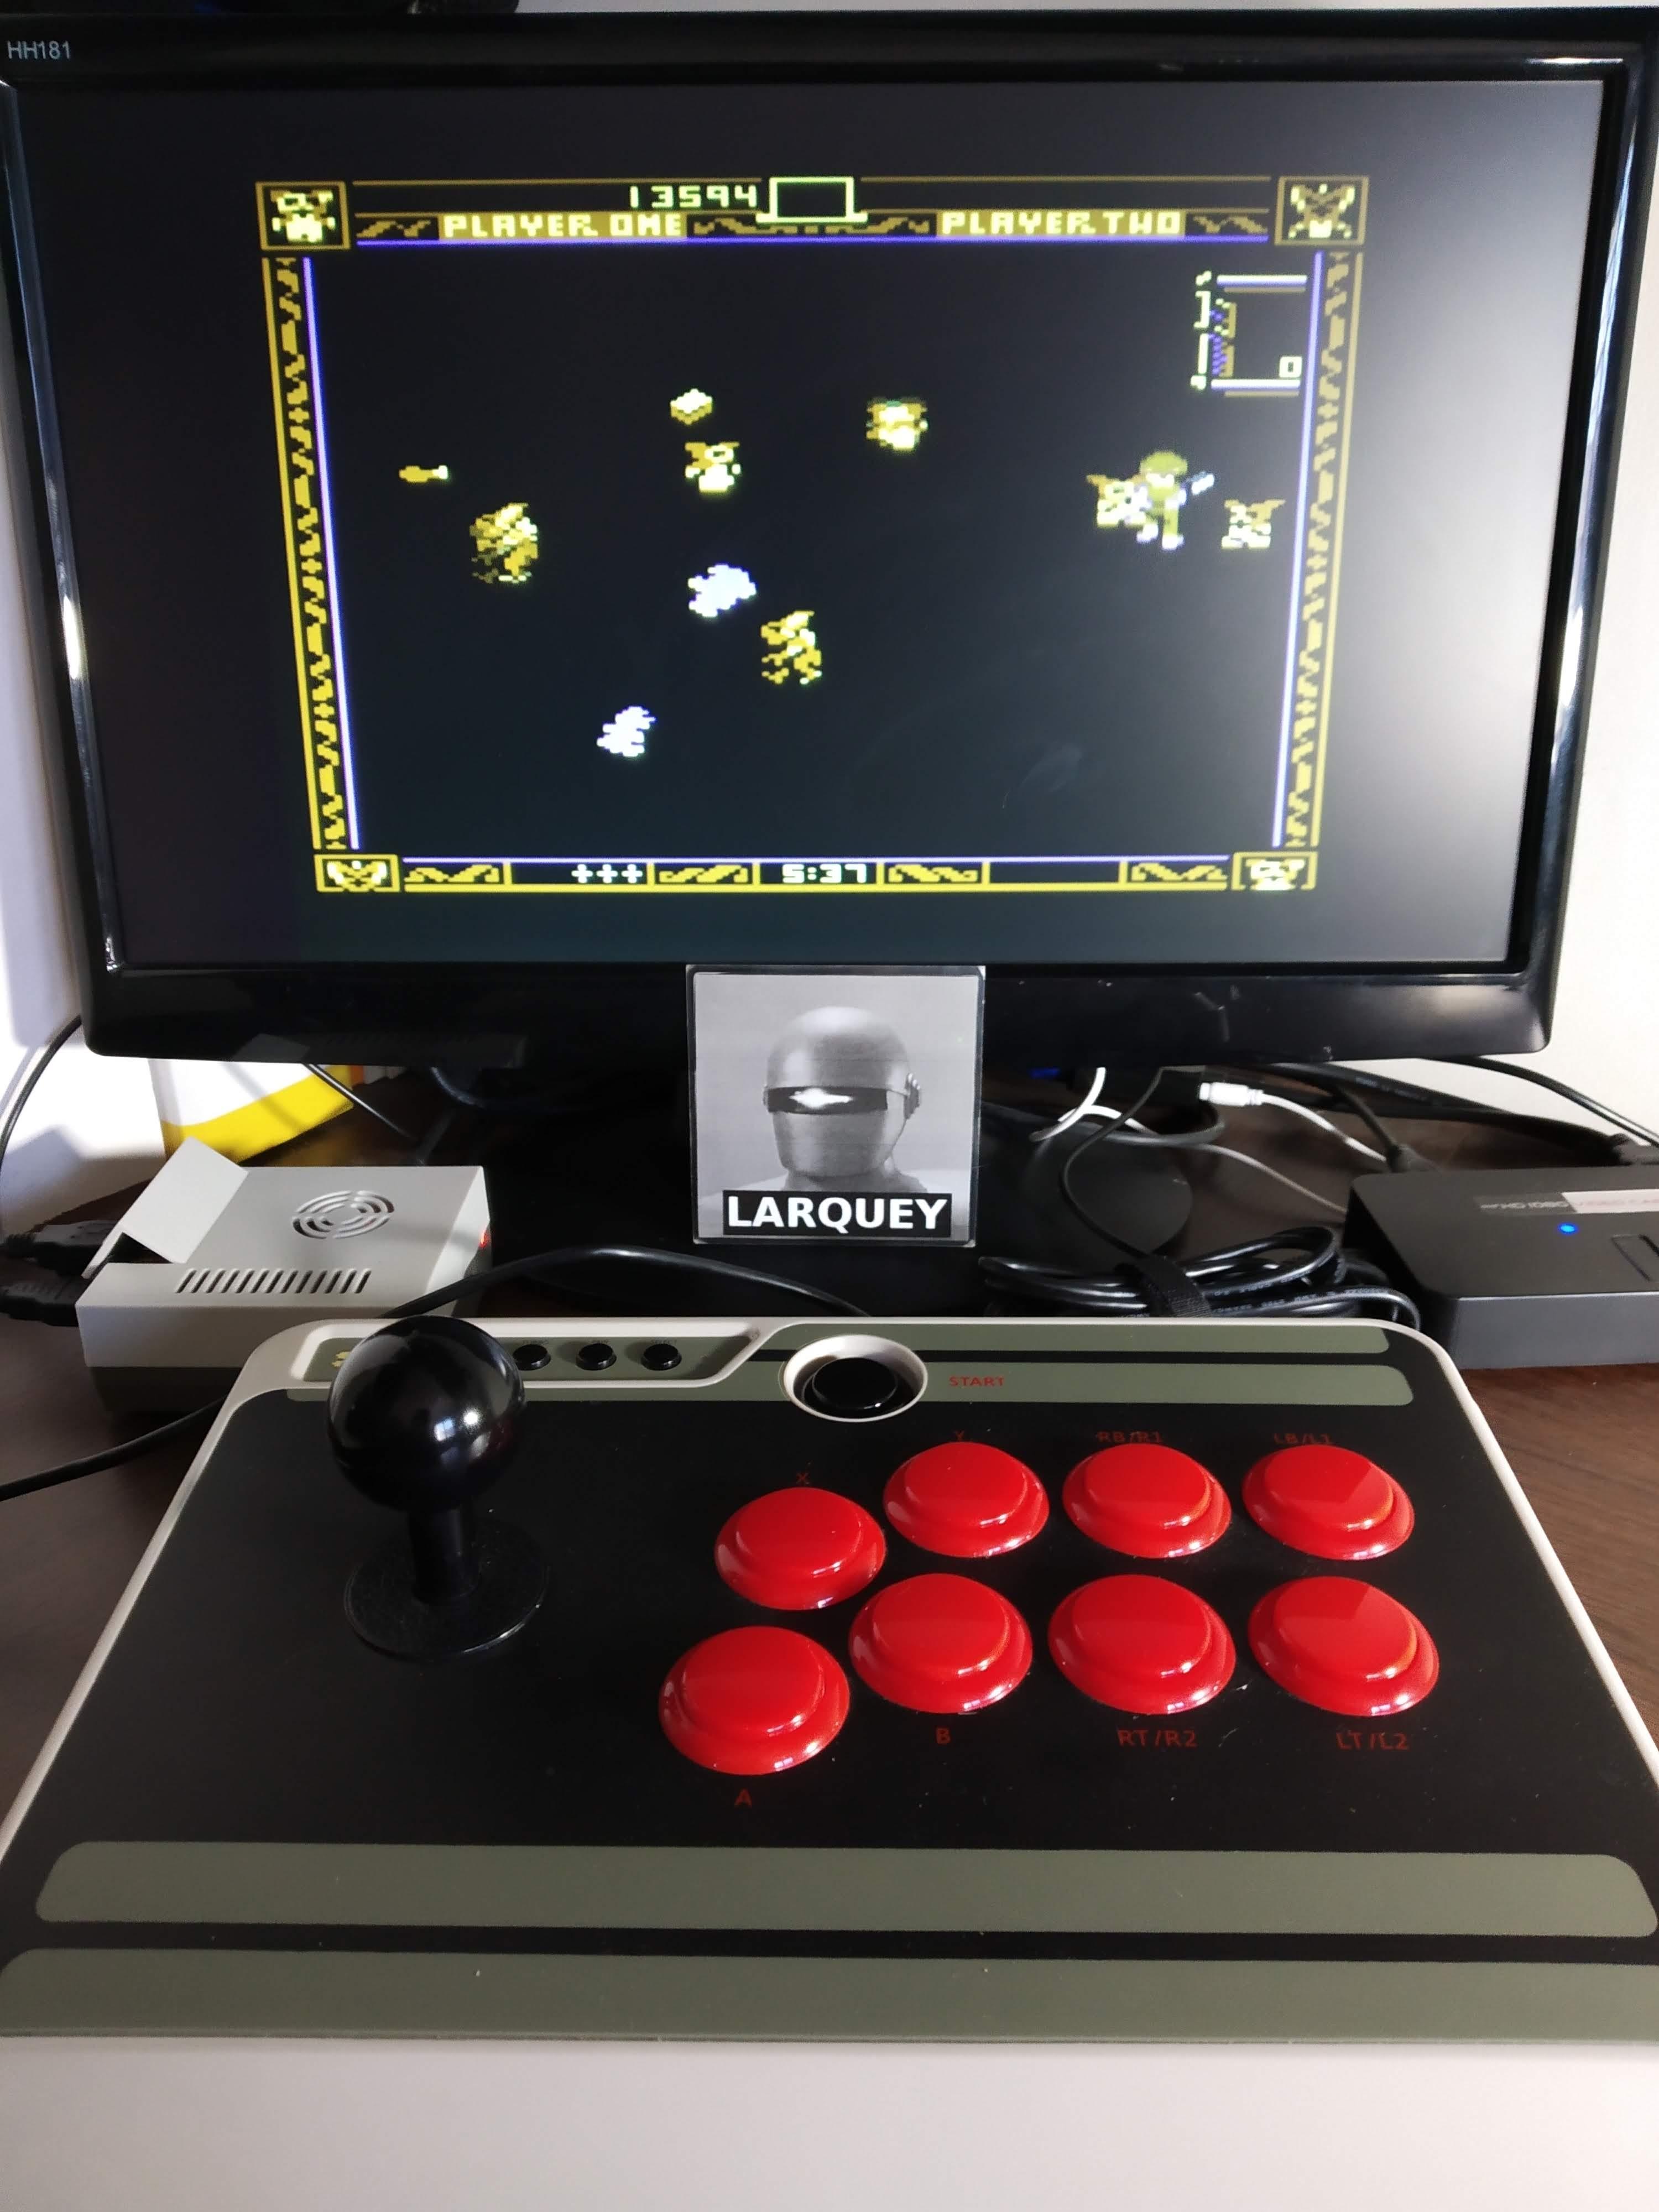 Larquey: Gremlins (Atari 5200 Emulated) 13,594 points on 2019-11-11 11:18:59